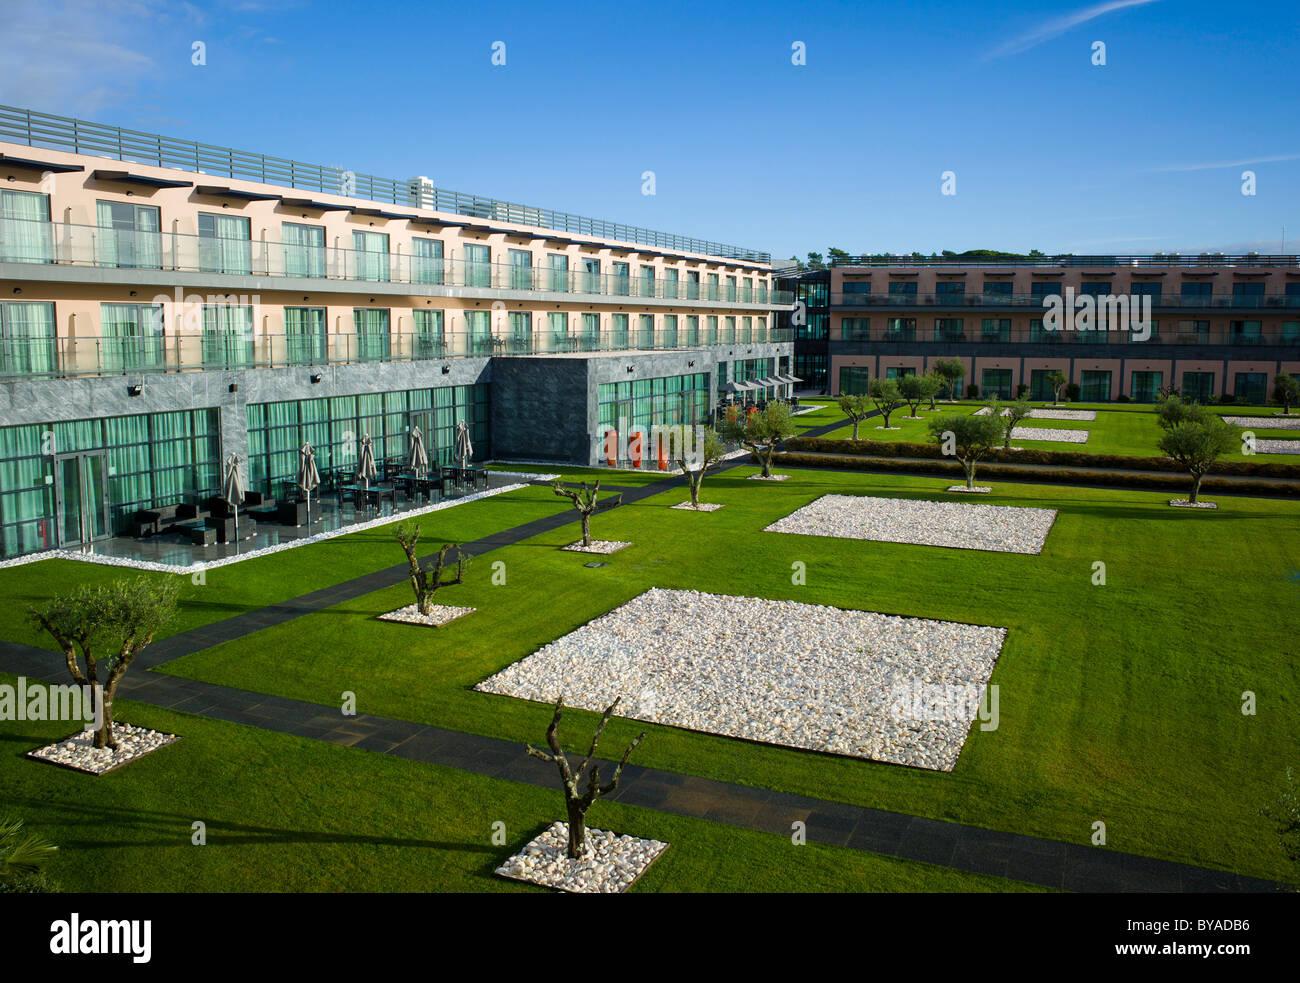 Hotel Vila Gale Lagos, Lagos, Faro, Telheiro, Portugal, Europe - Stock Image